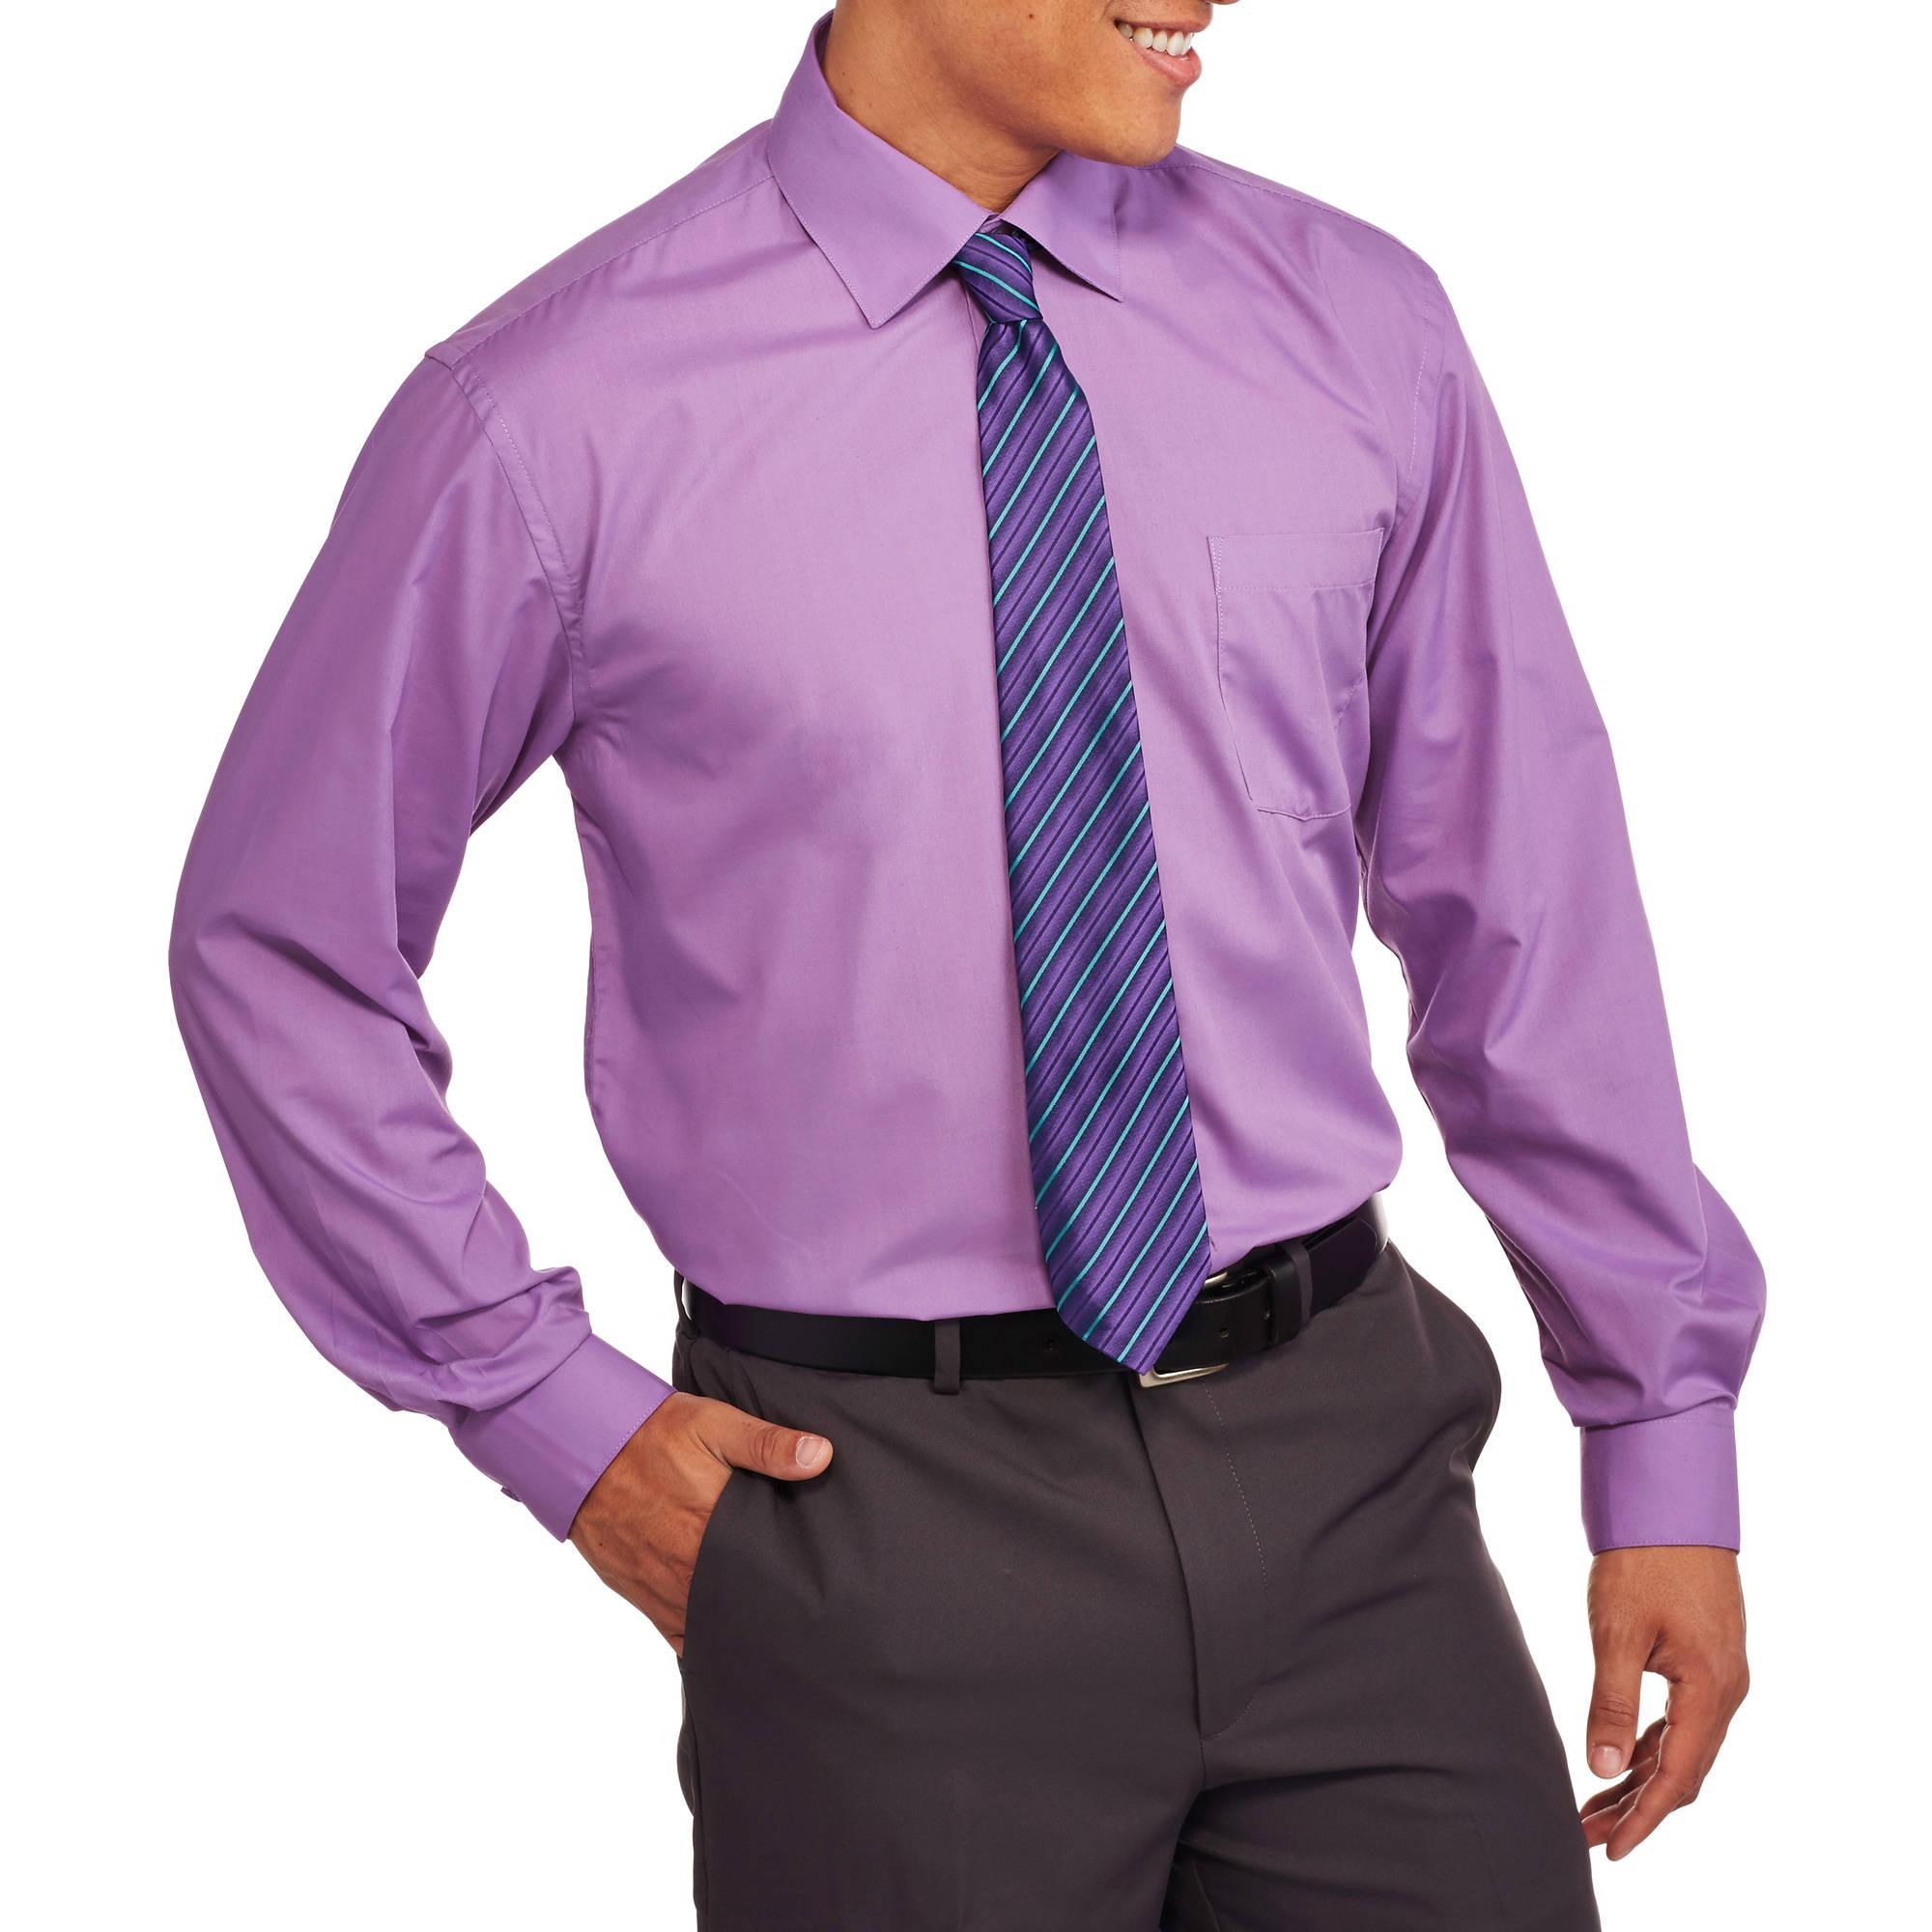 Big Men's 2-Piece Solid Dress Shirt and Tie Set